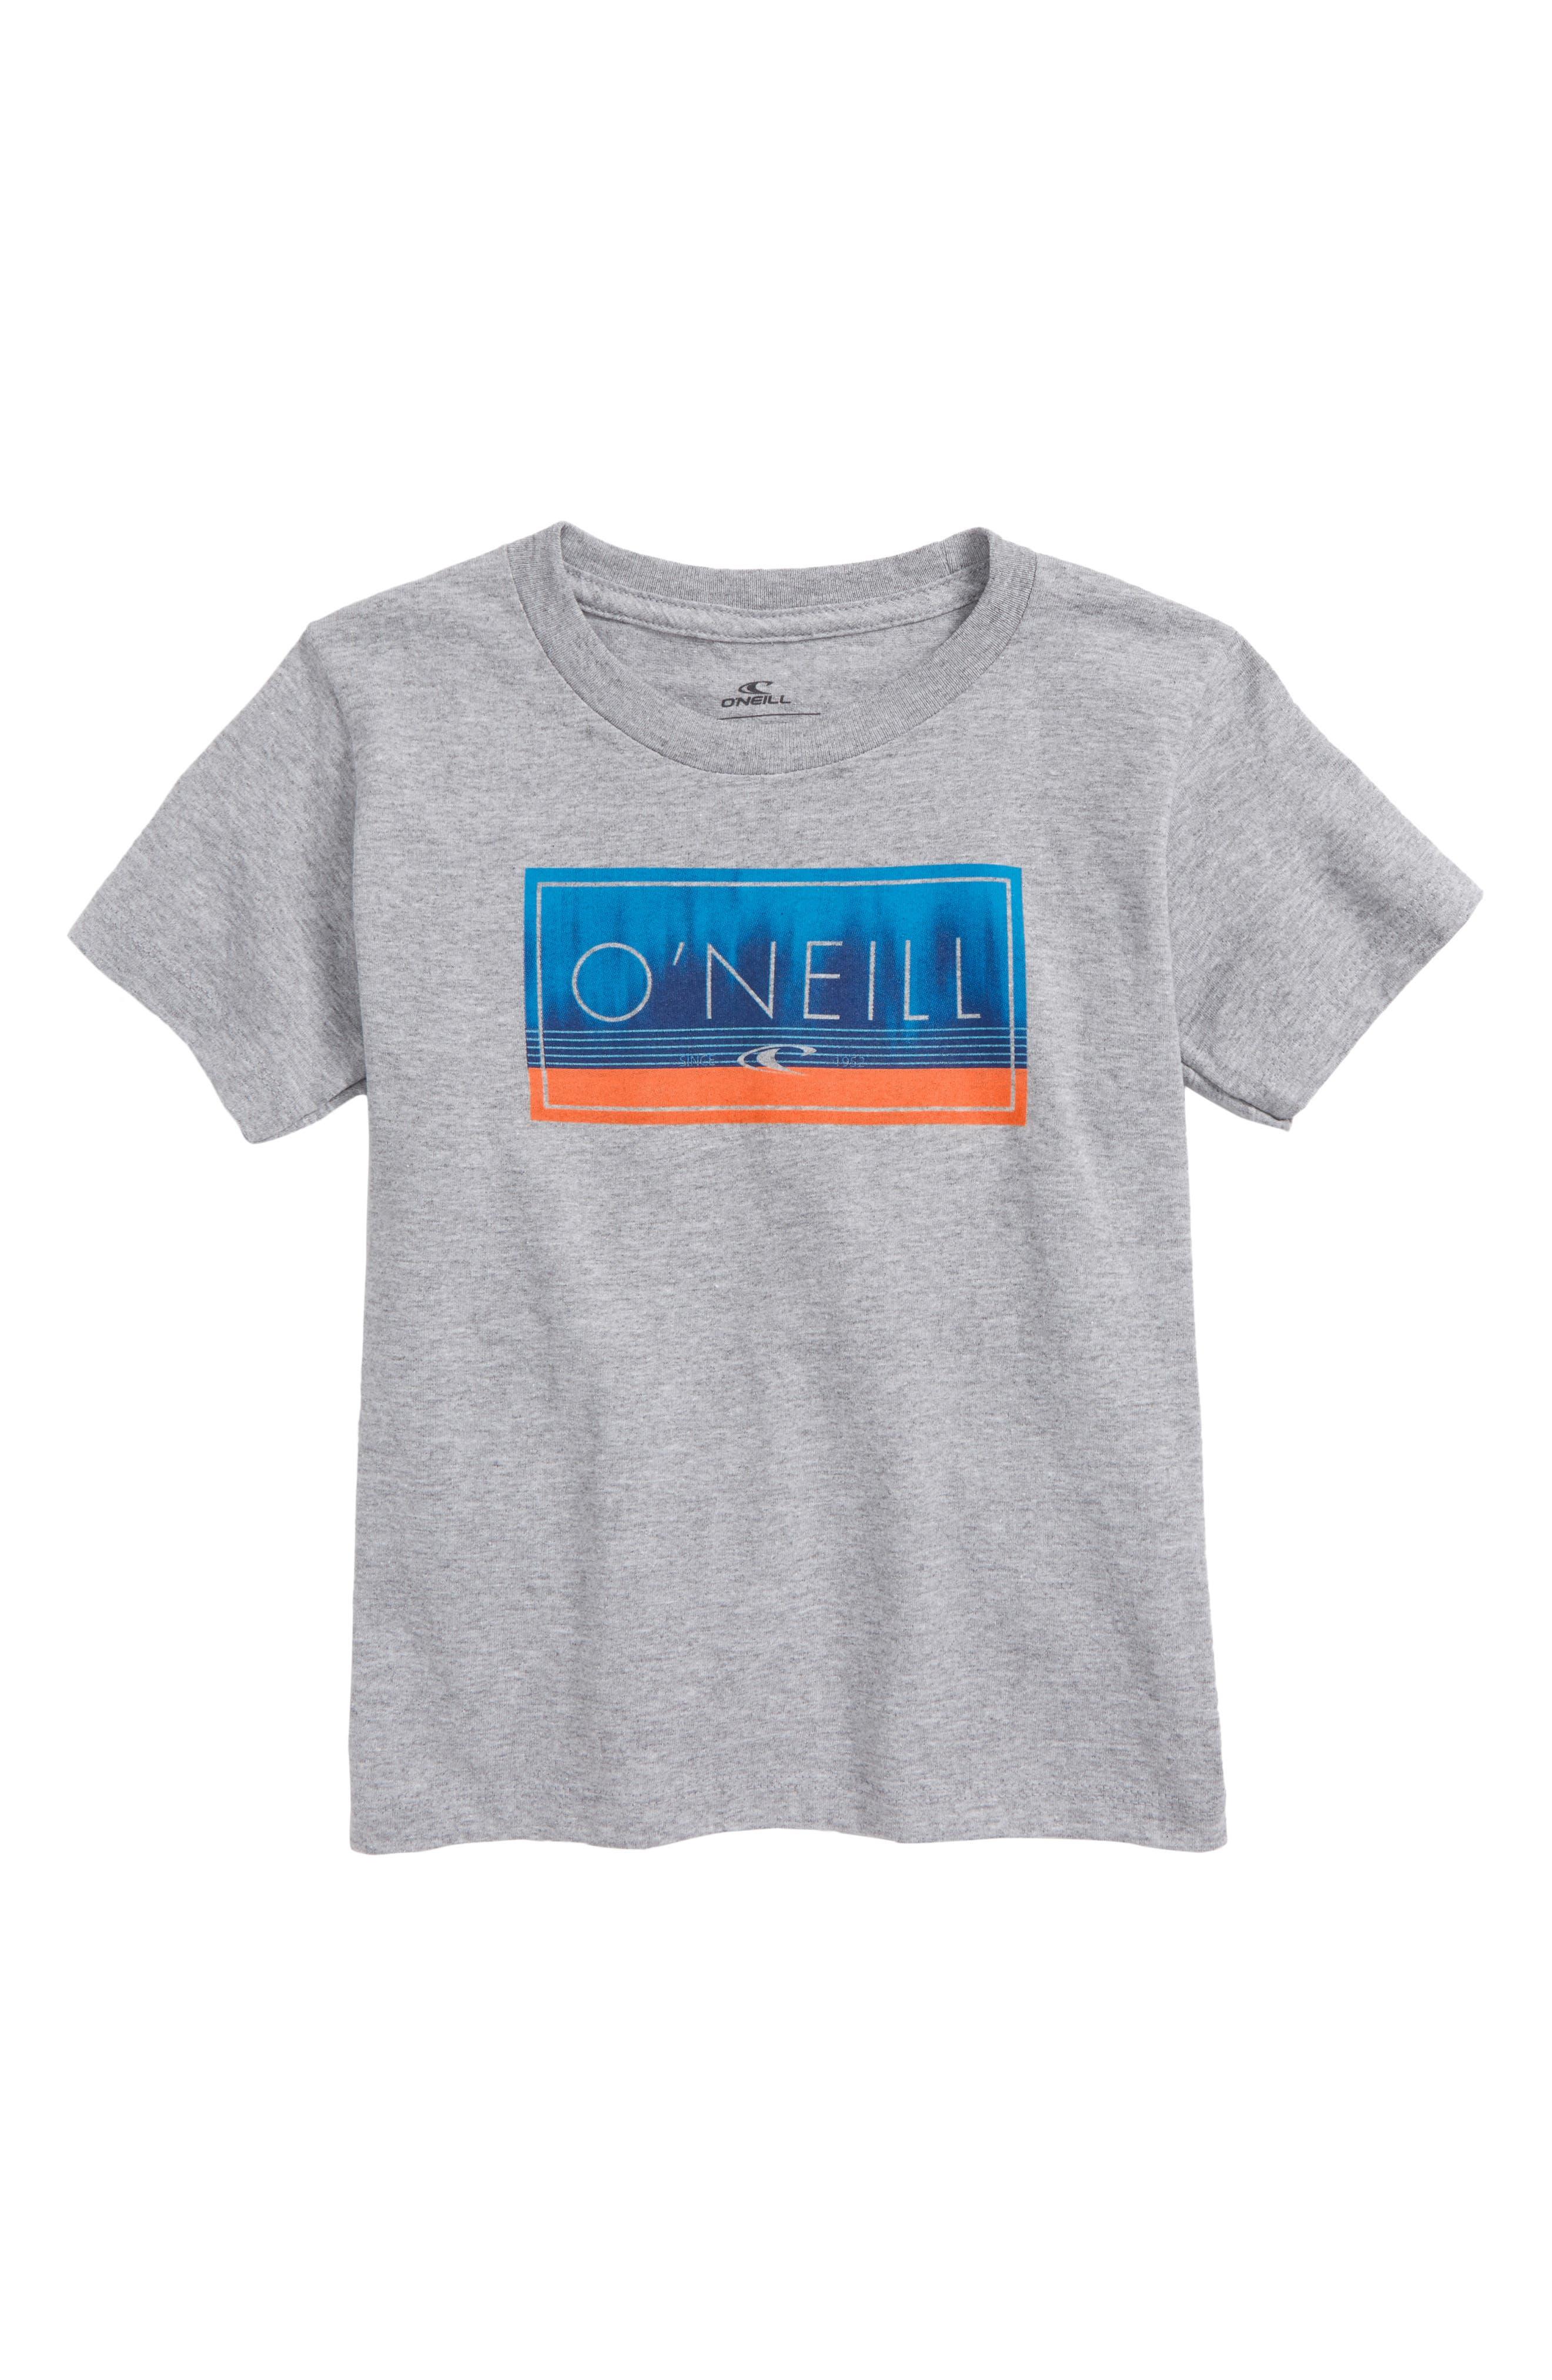 Arts Graphic T-Shirt,                         Main,                         color, 030